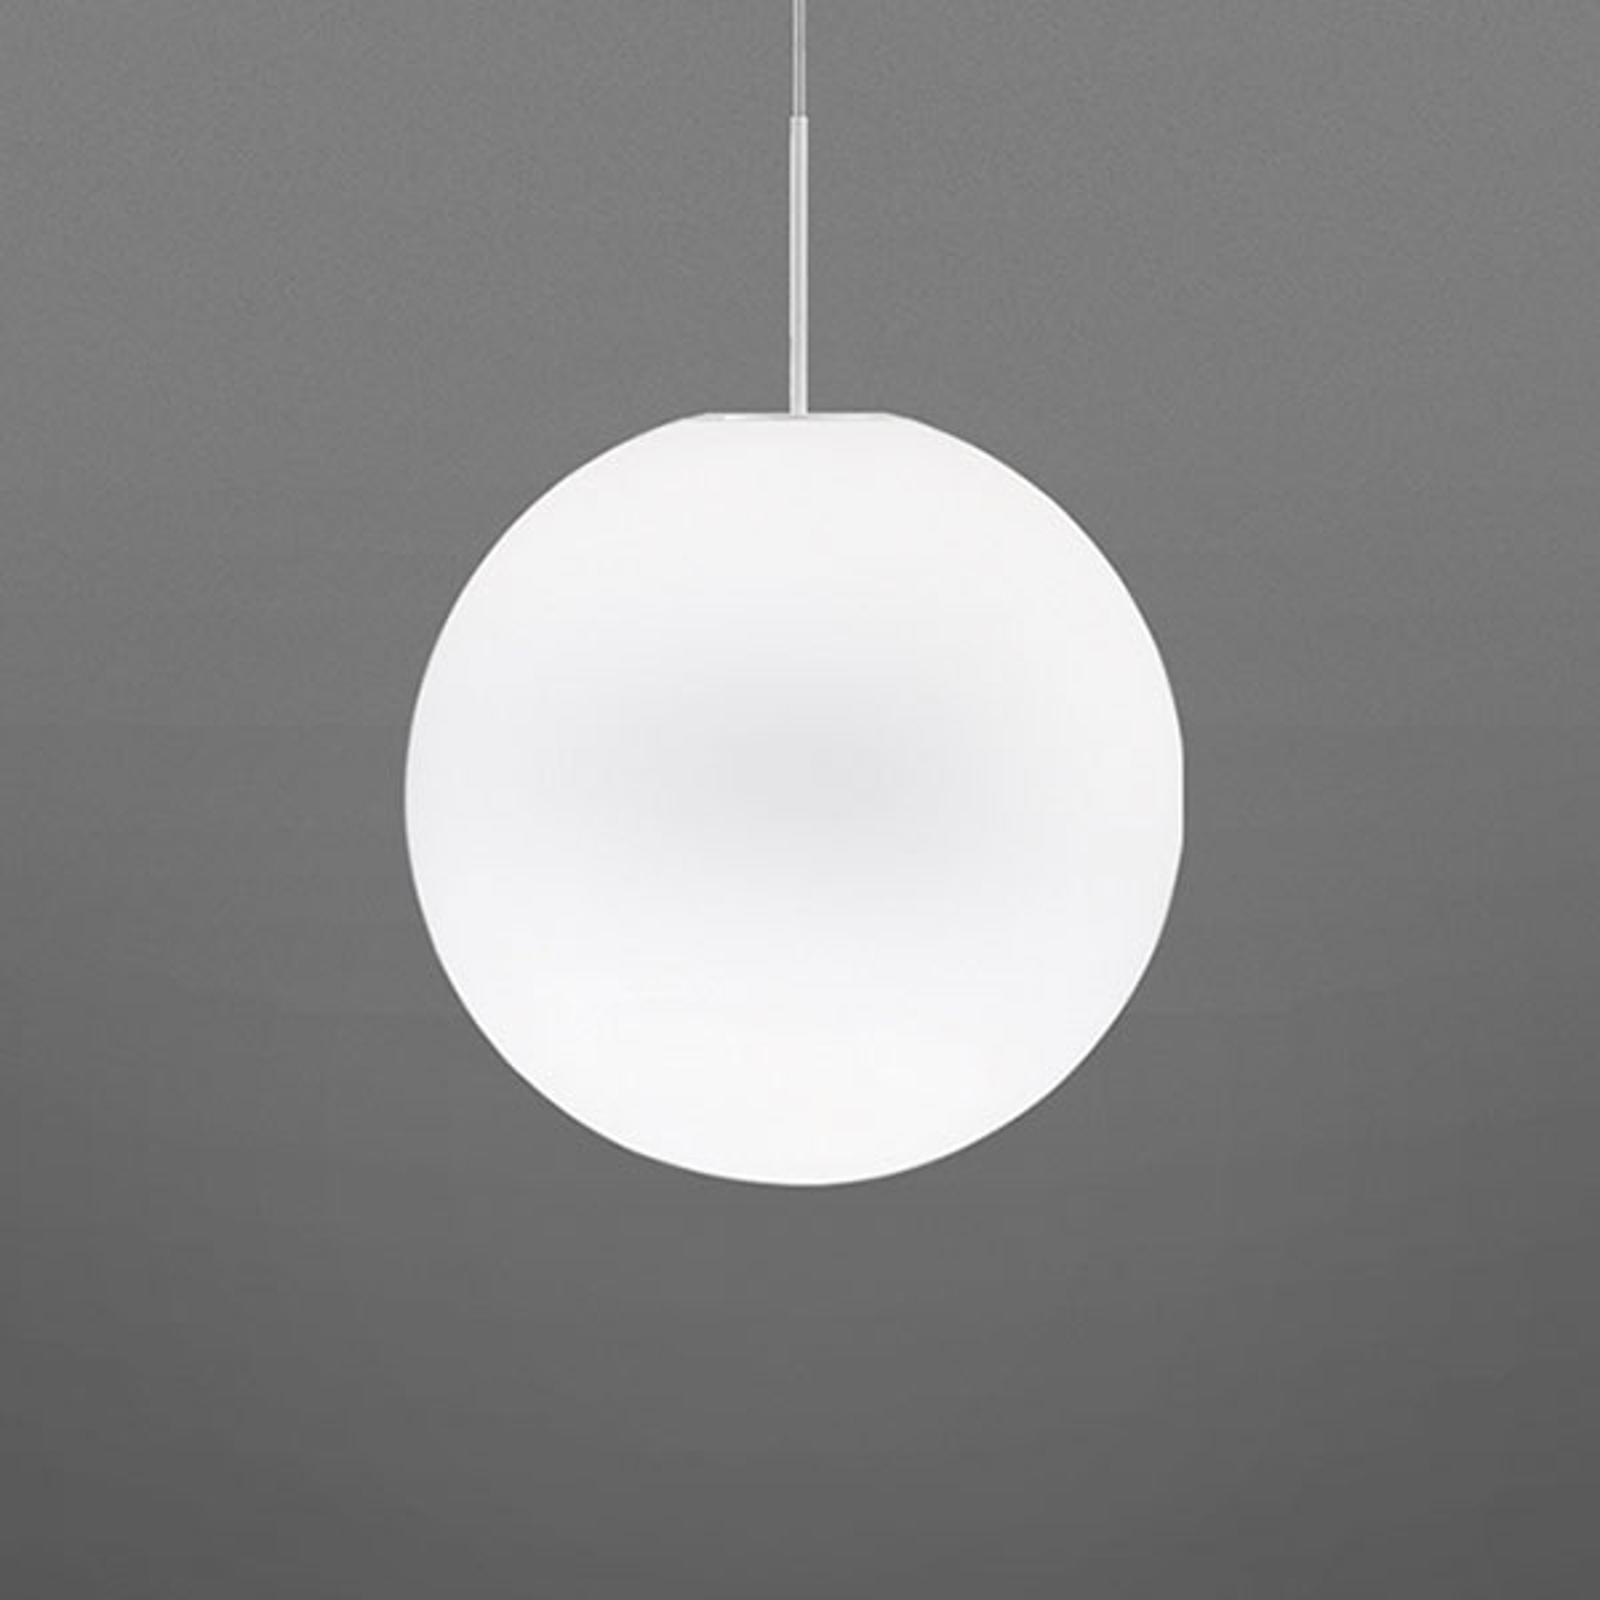 Fabbian Lumi Sfera Glas-Hängeleuchte, Ø 20 cm